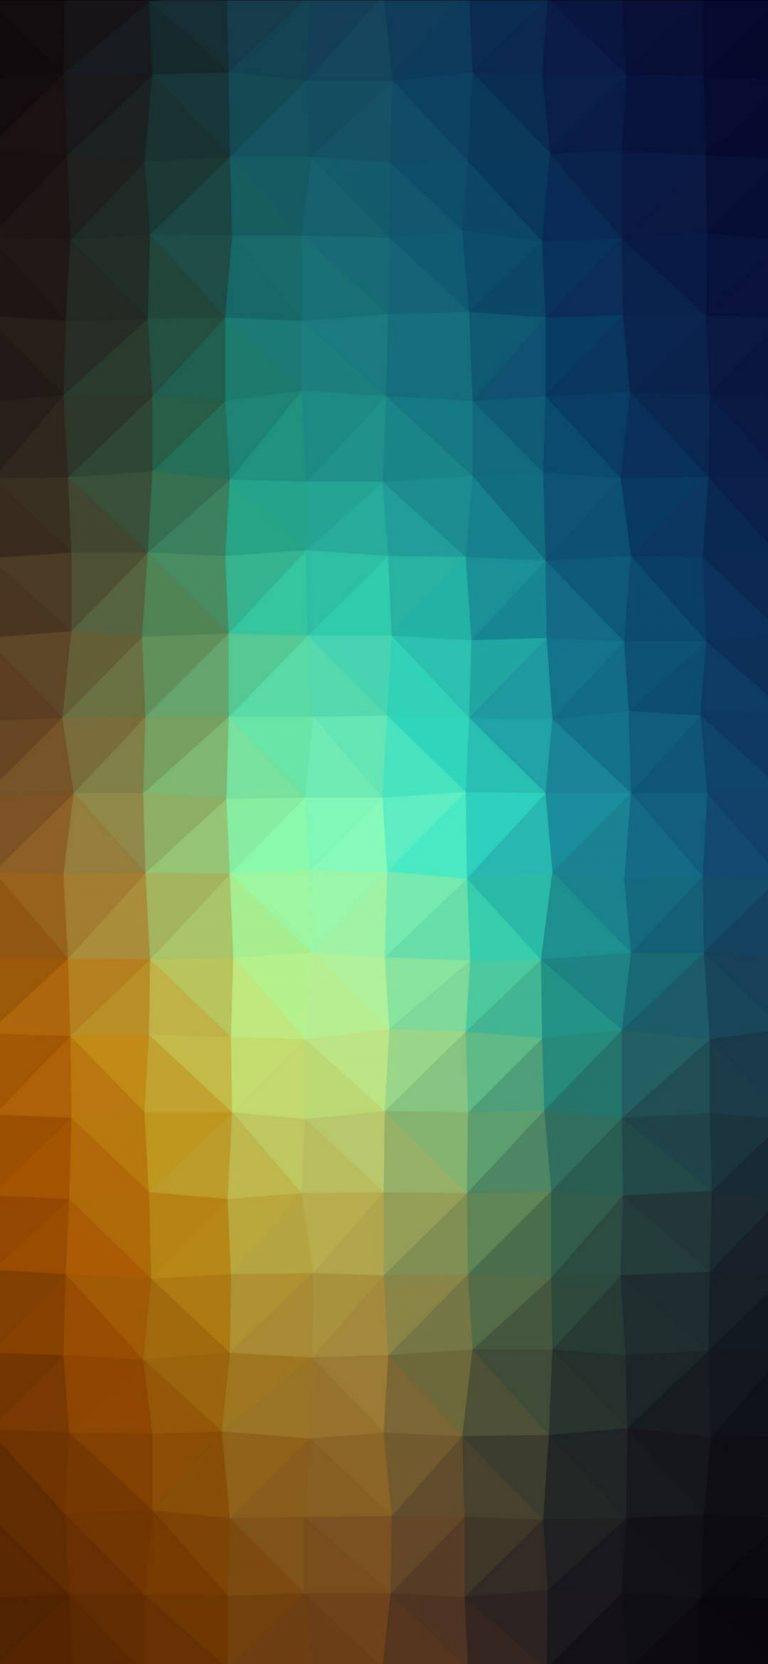 WhatsApp Background Wallpaper 73 768x1664 - WhatsApp Background Wallpaper - 73